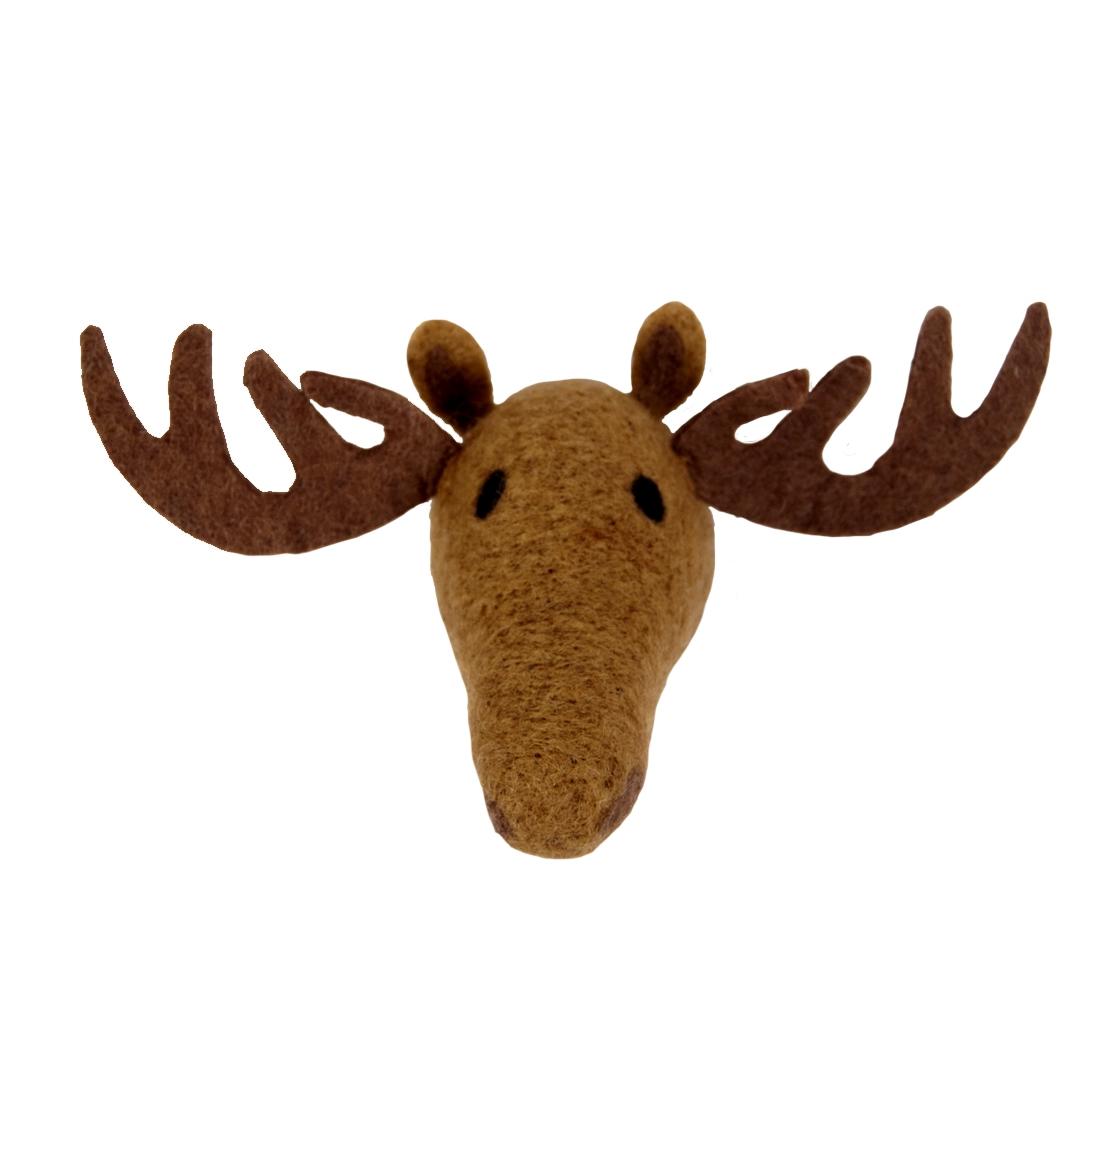 Animal Head Moose handfiltad ull, Klippan Yllefabrik